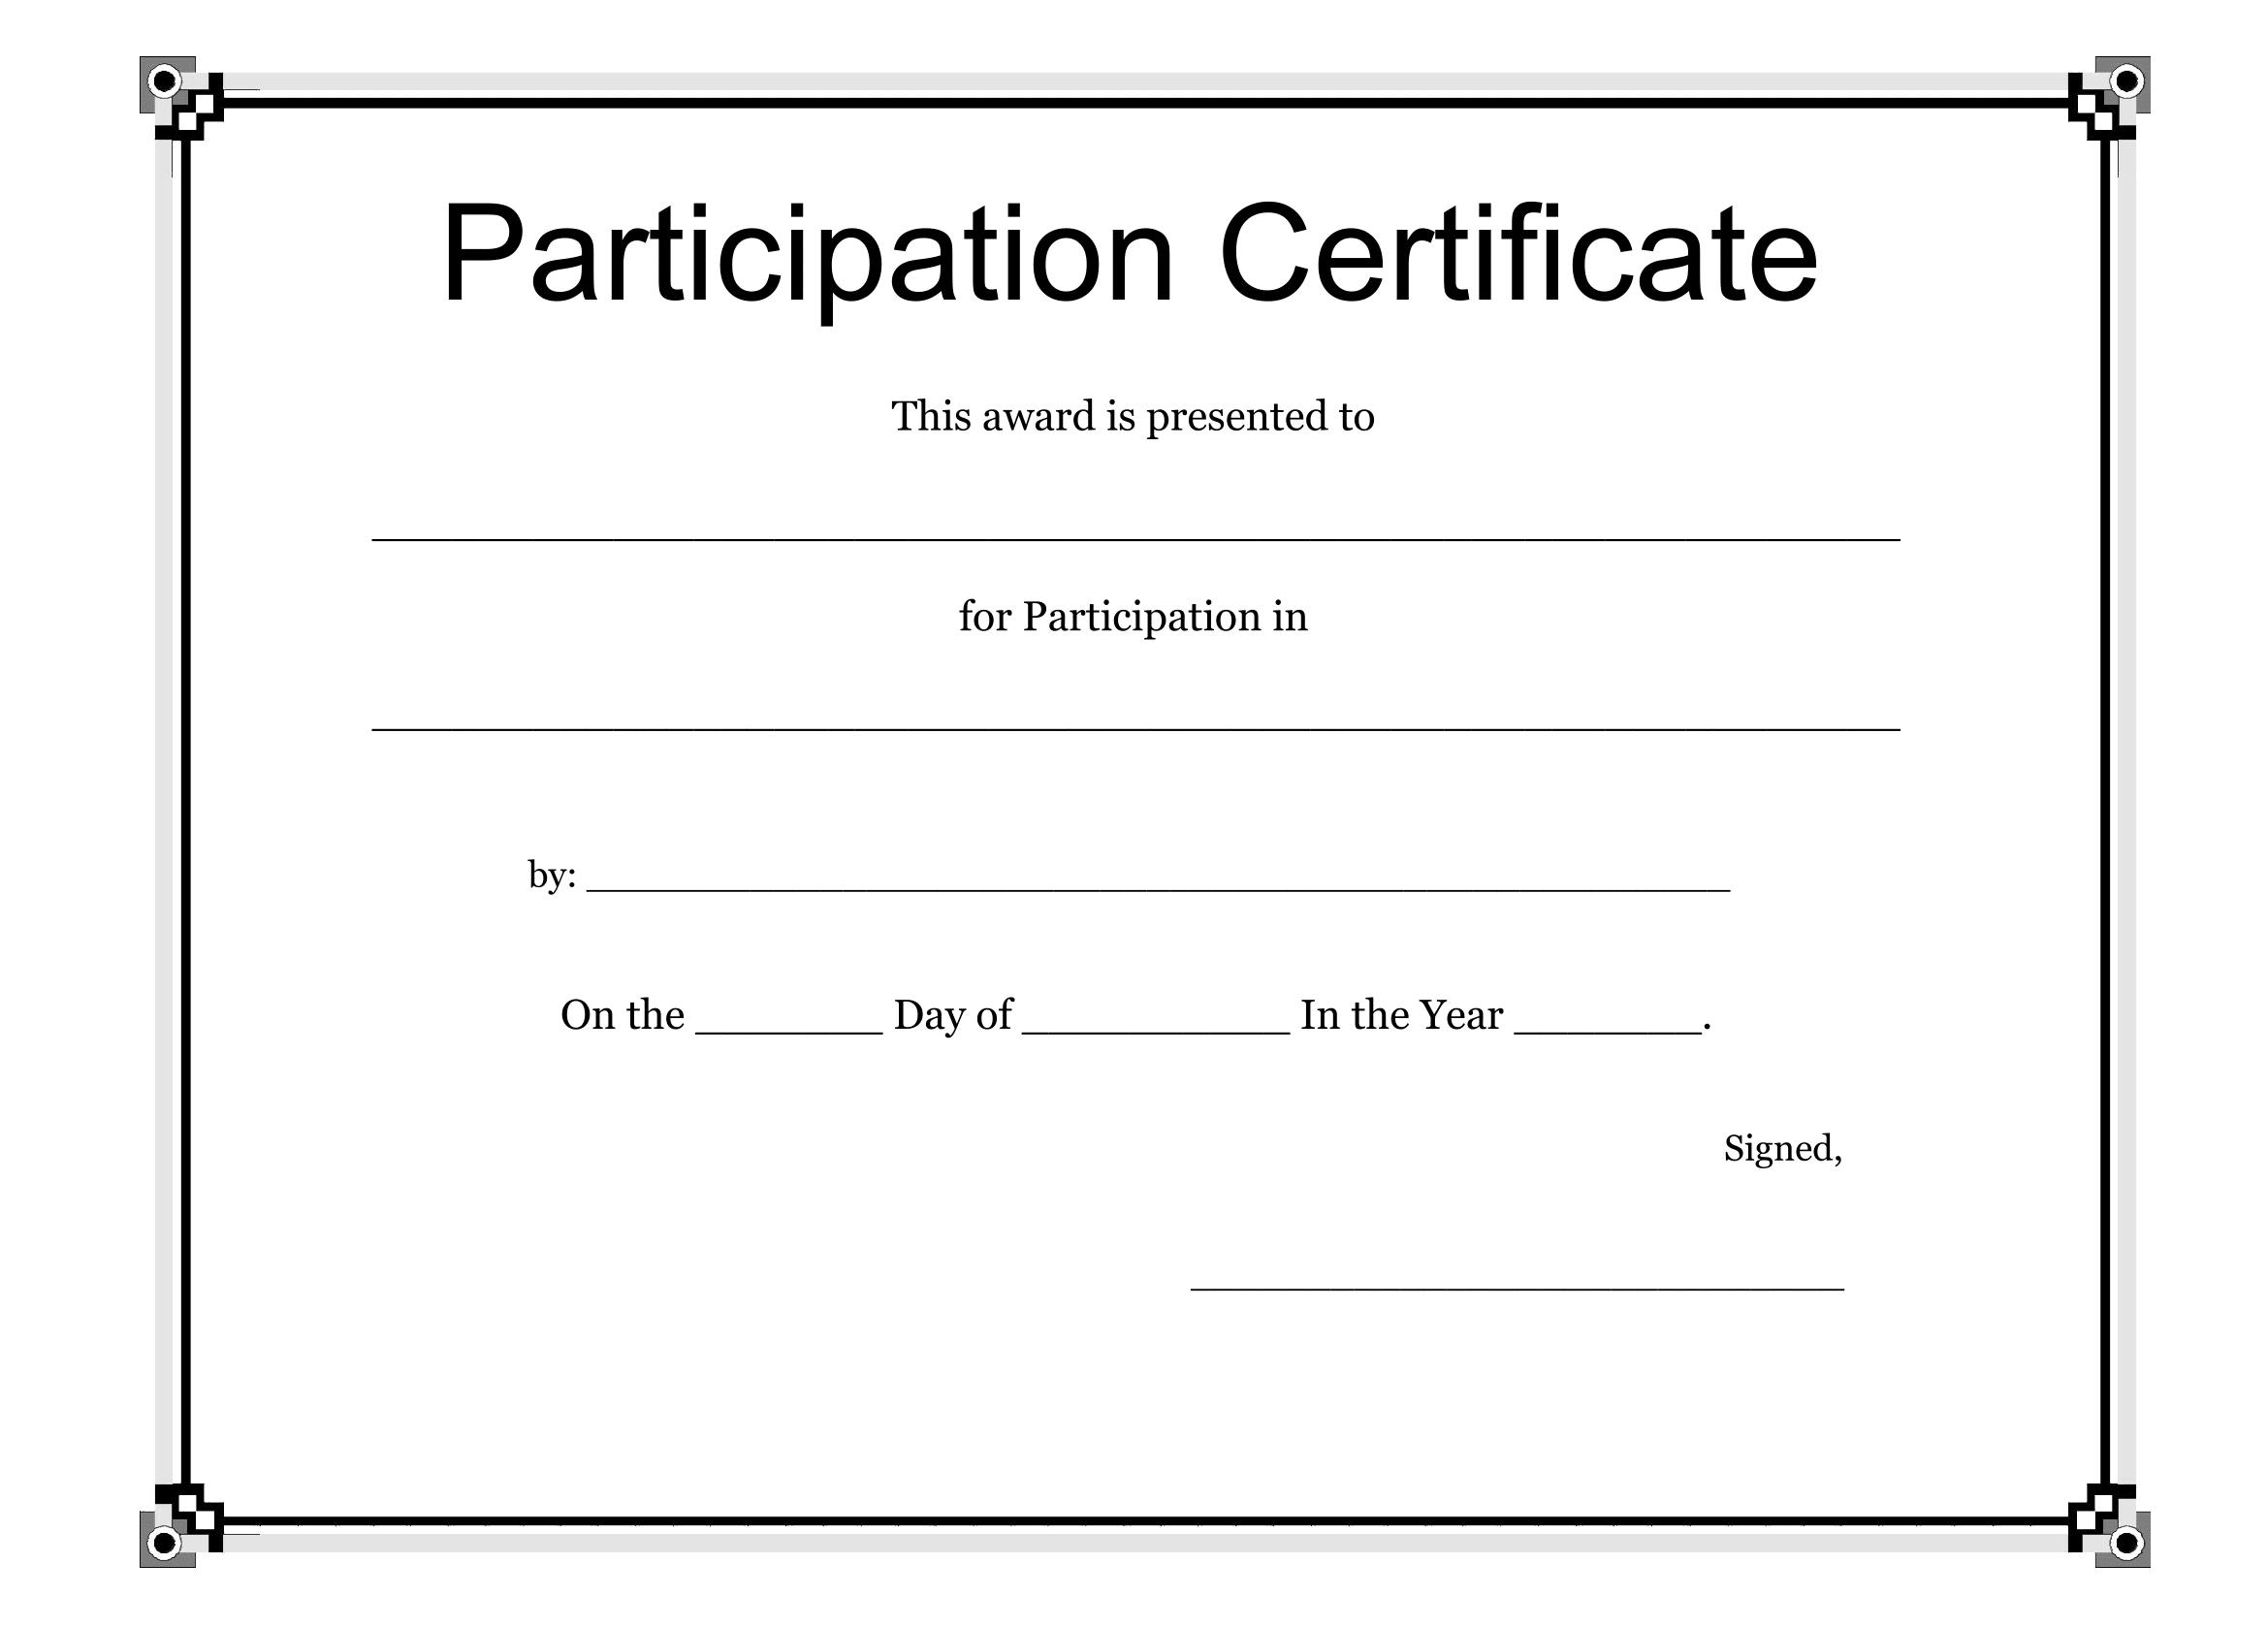 Participation Certificate Template  Free Download Regarding Certificate Of Participation Template Pdf